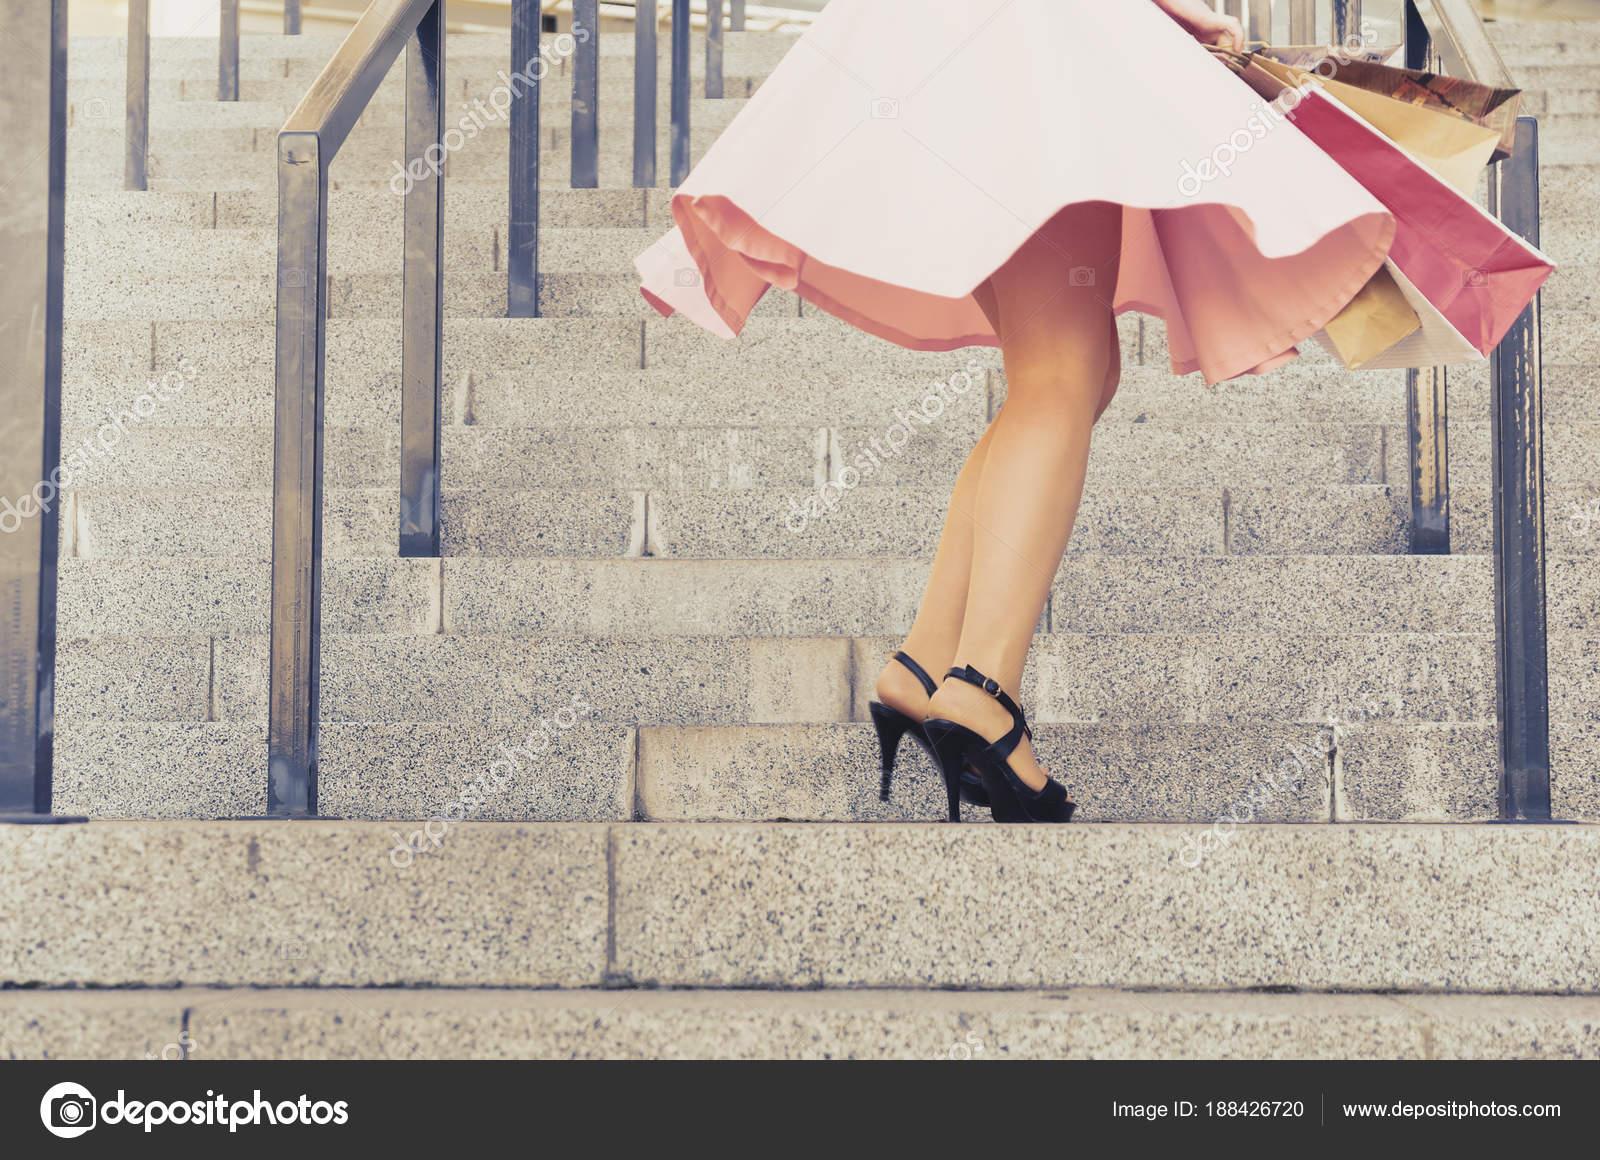 На лестнице в юбке фото, лесби под дождем фото